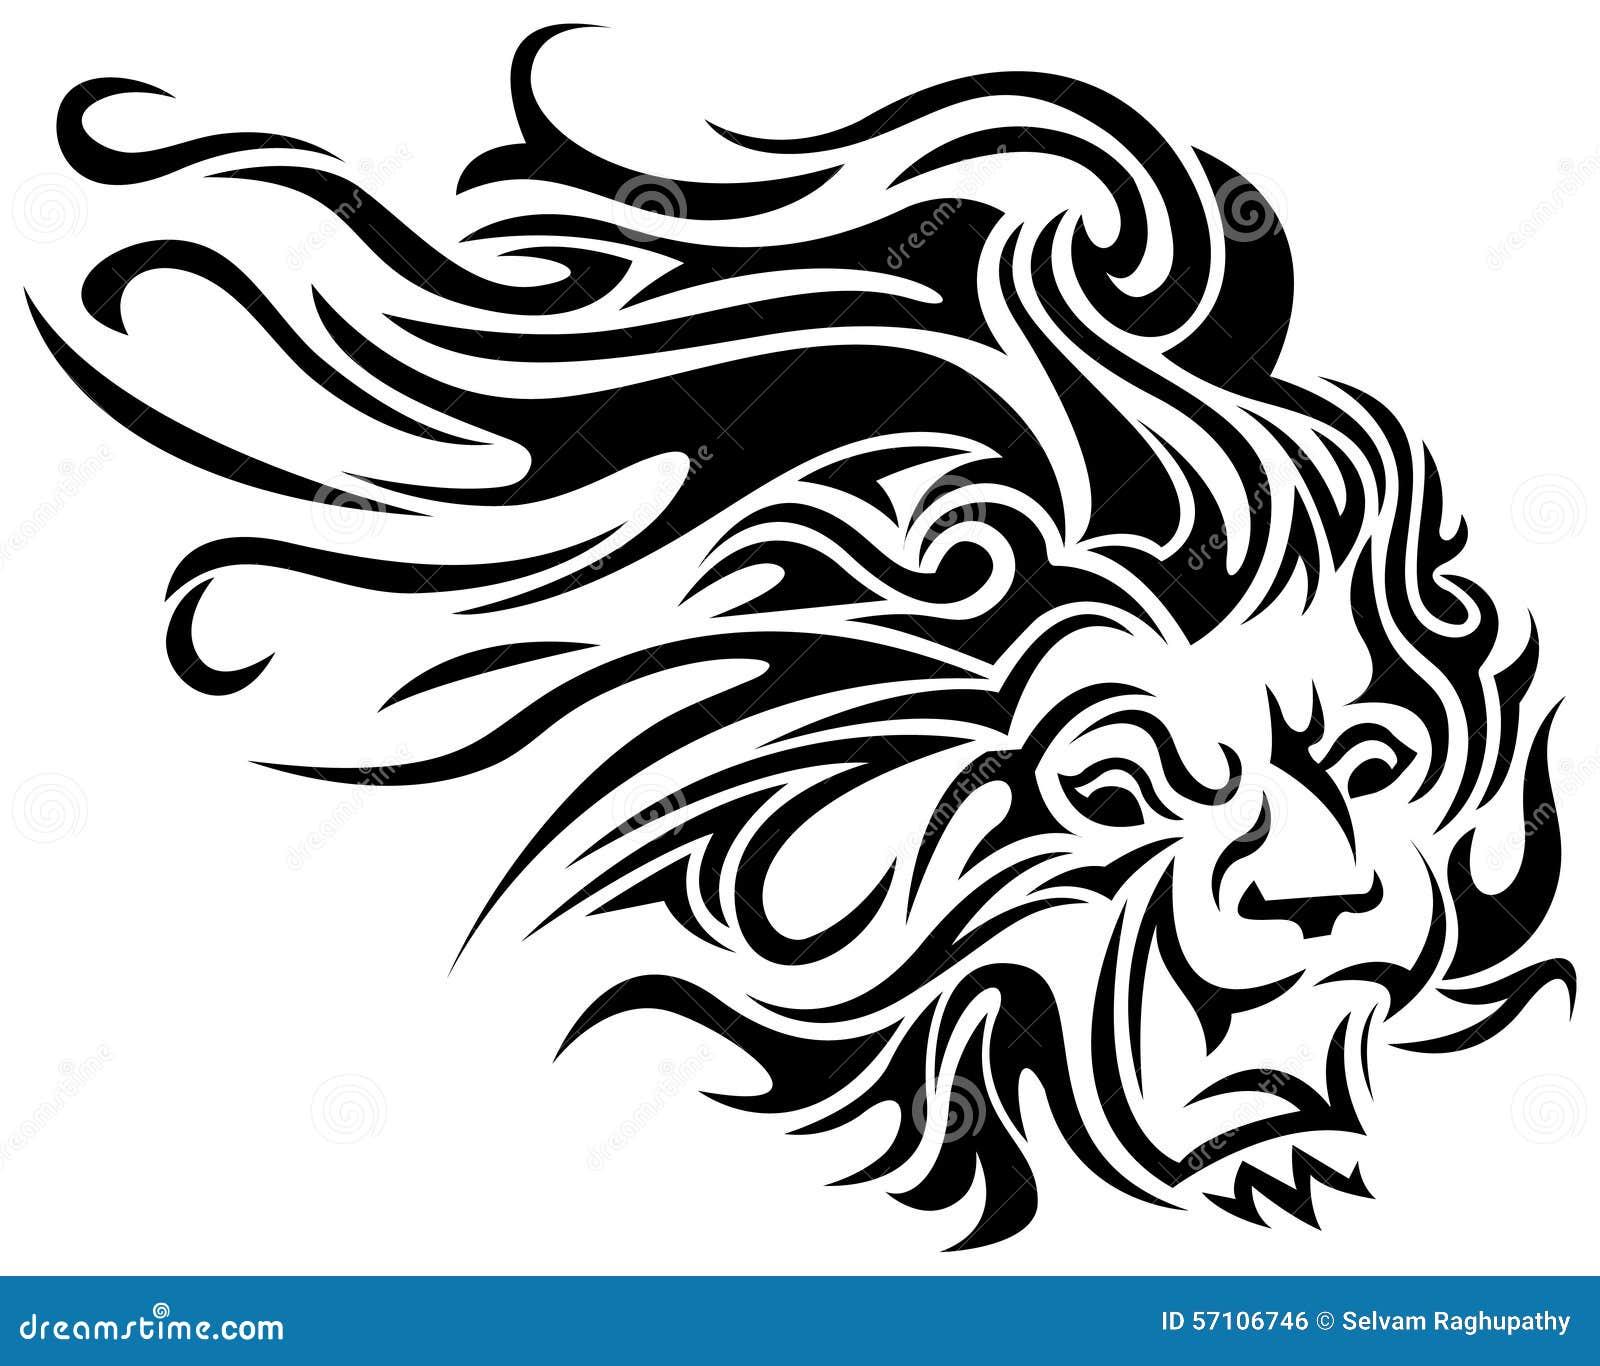 Tribal Tattoo Line Drawing : Lion tribal tattoo stock vector image